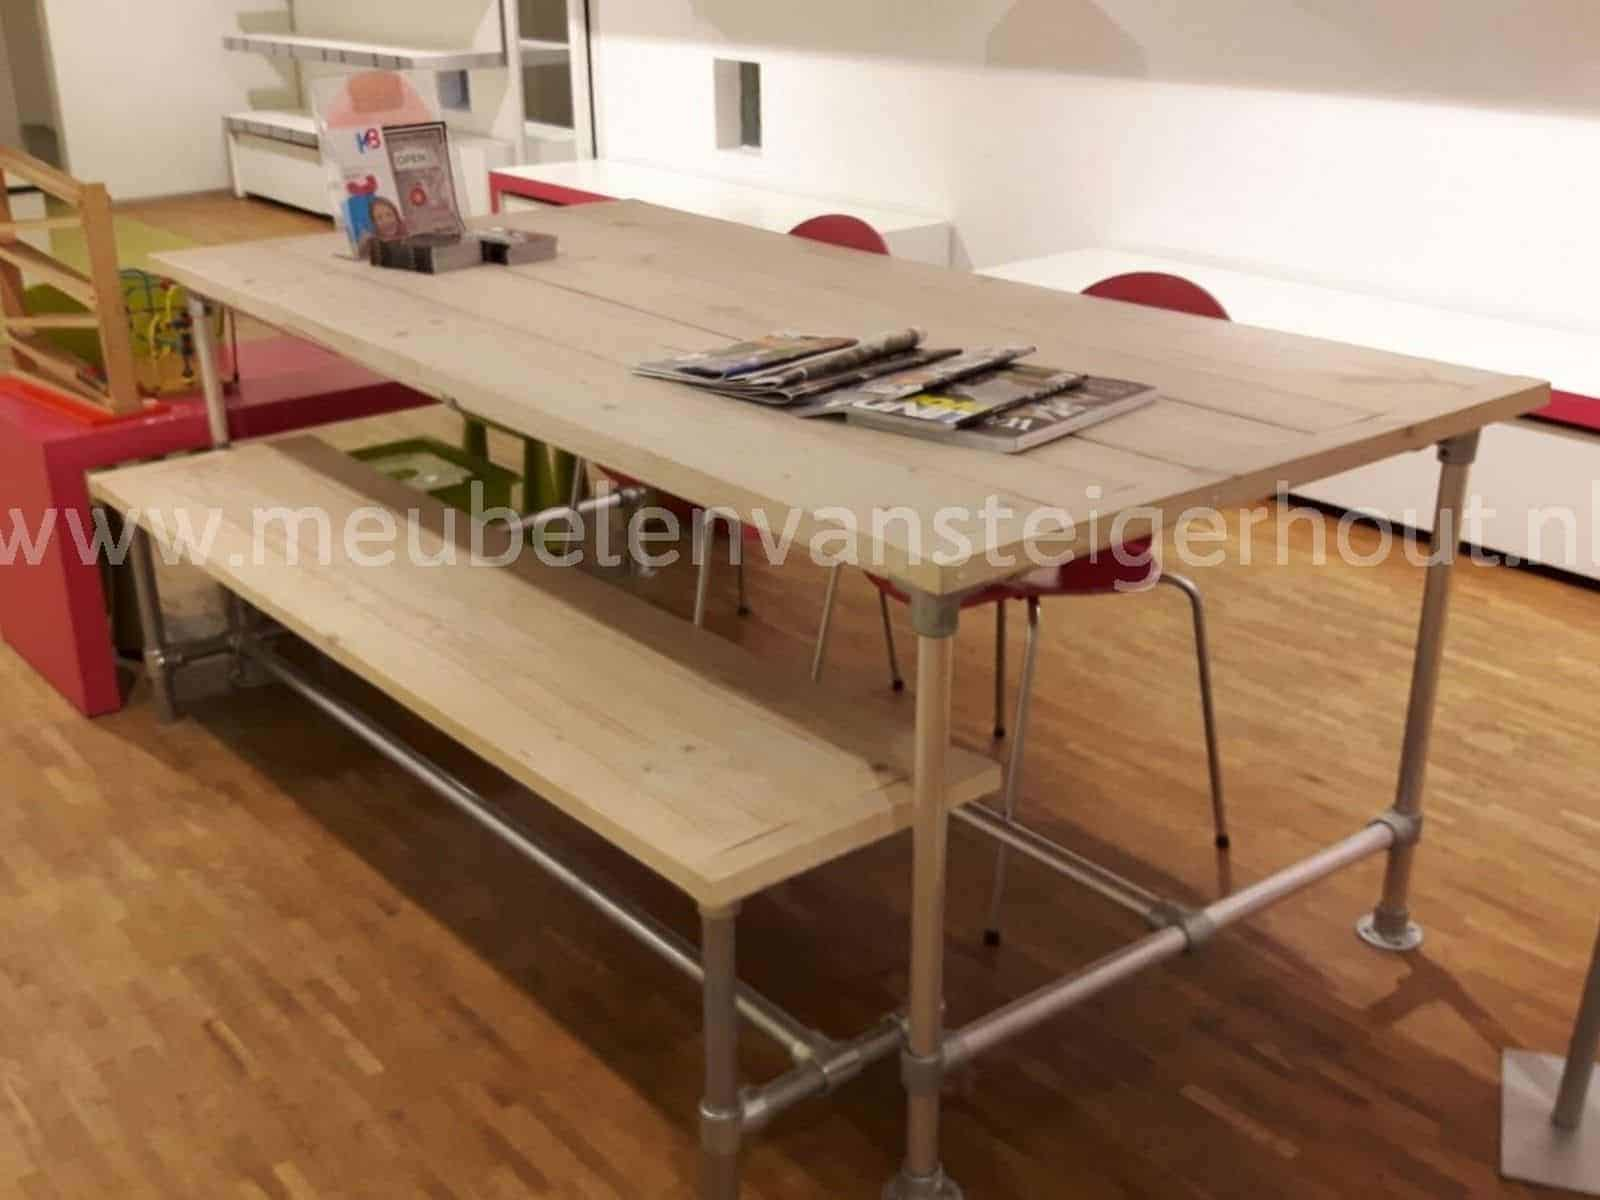 Eettafel steigerbuis meubelen van steigerhout